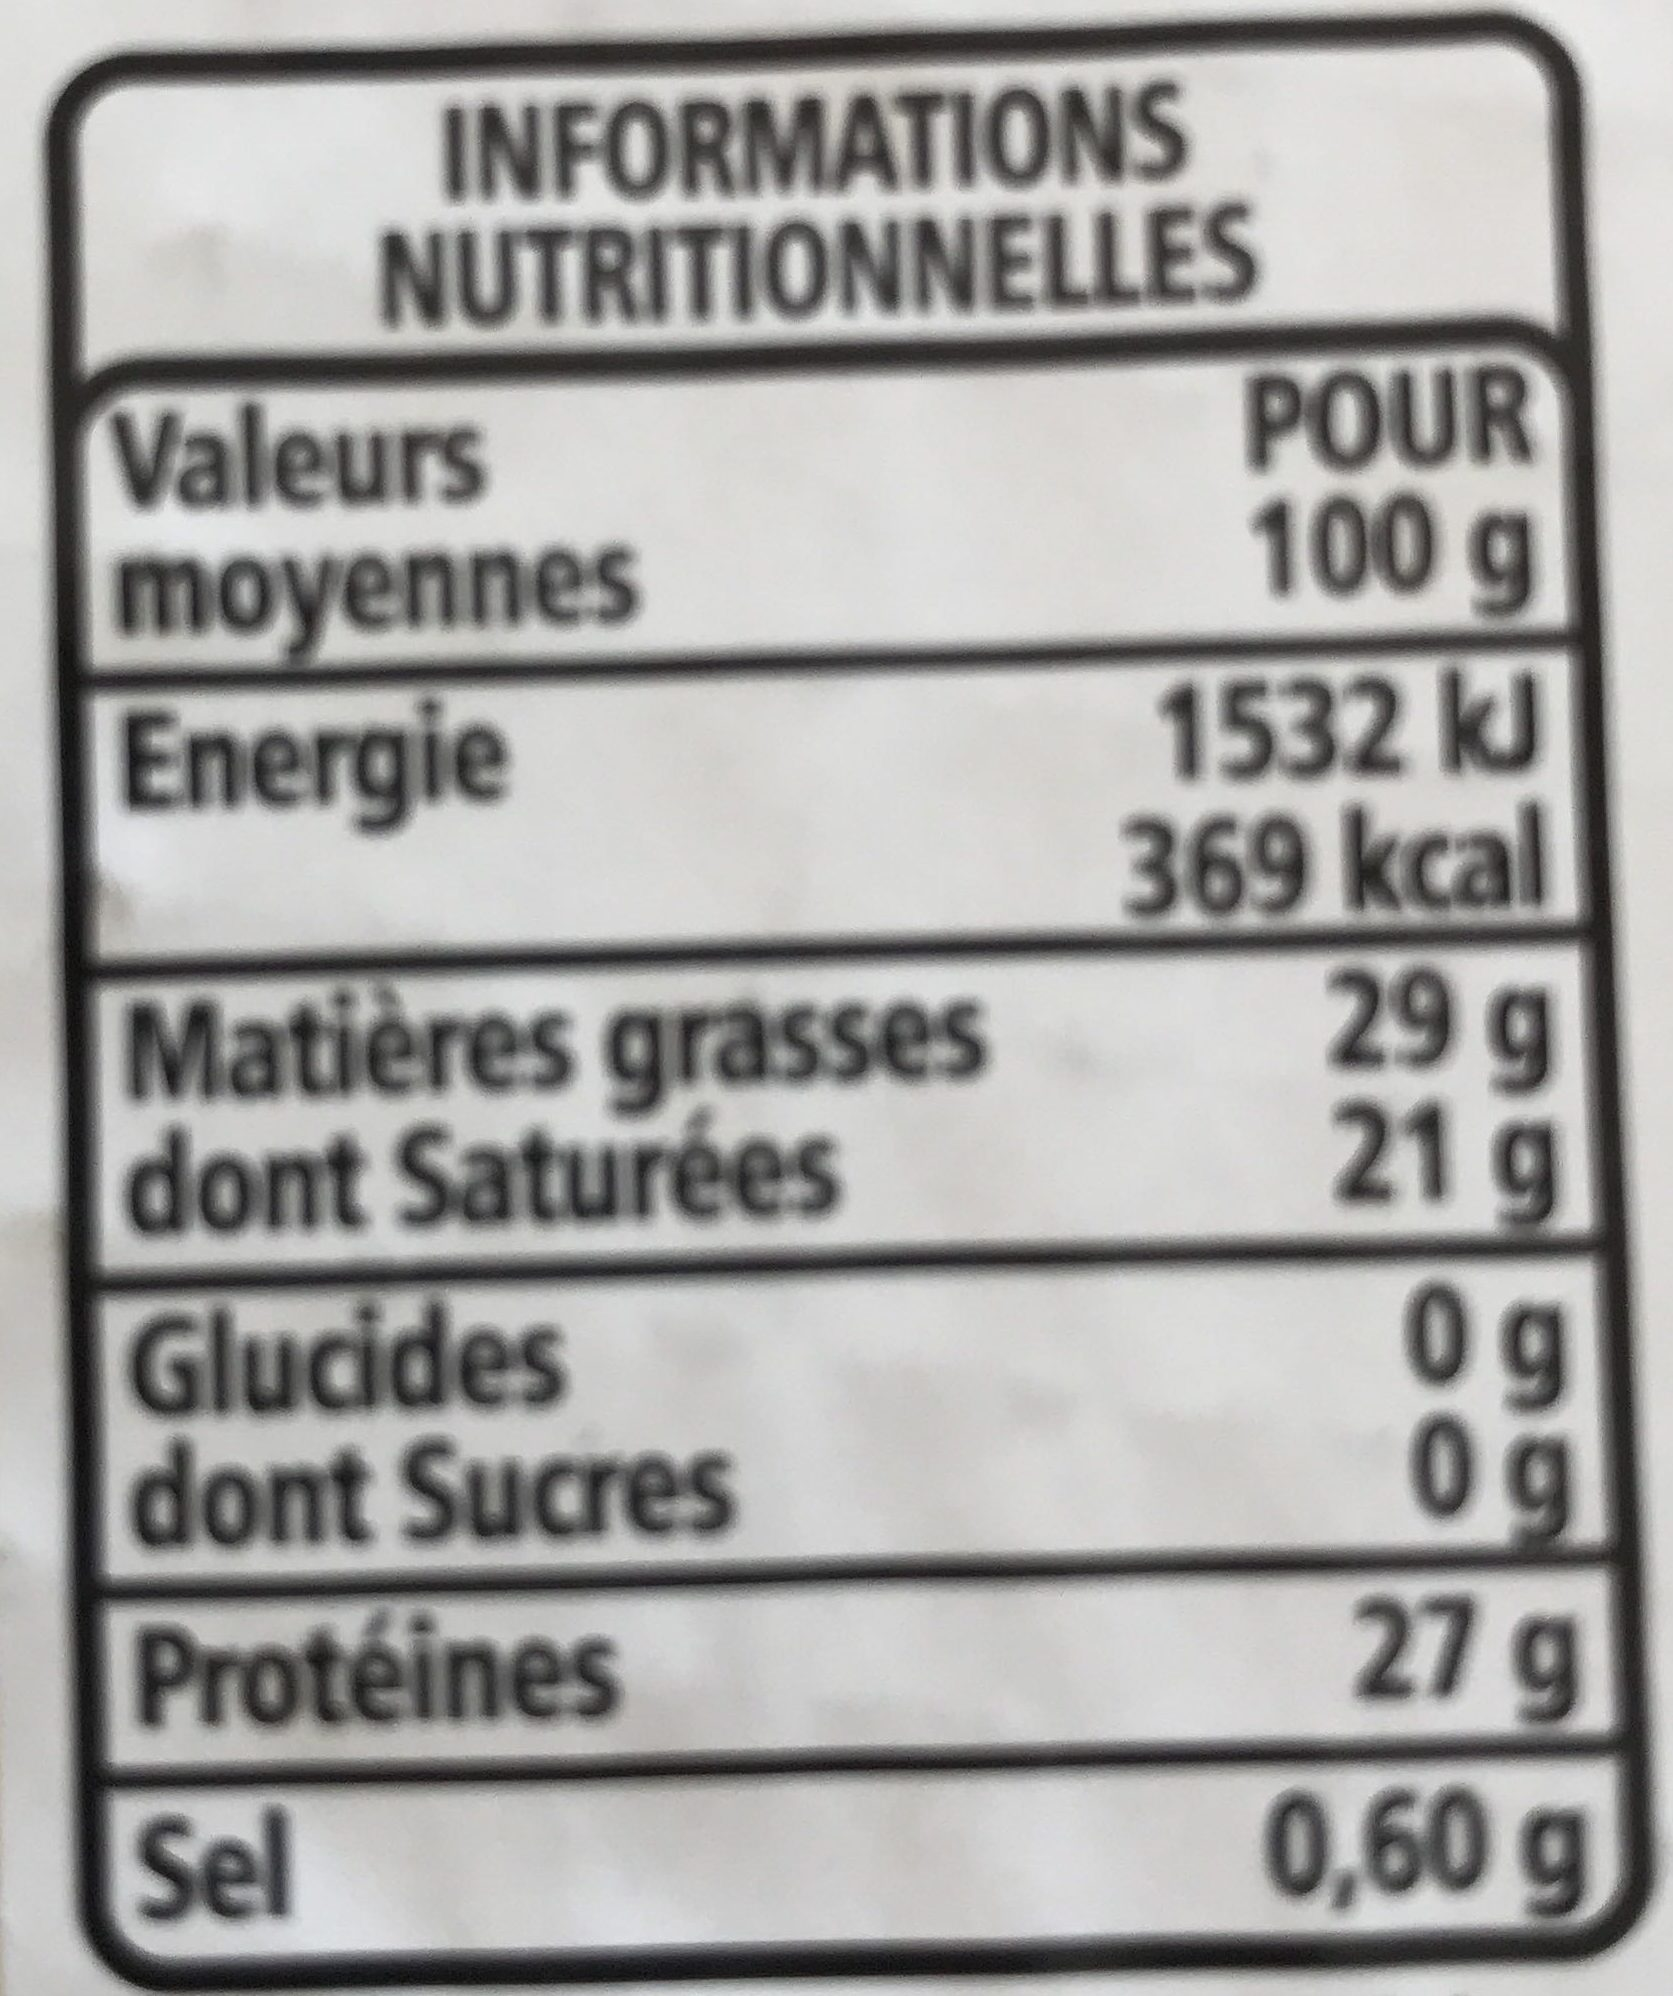 Emmental Français - 15 tranches environ - Voedingswaarden